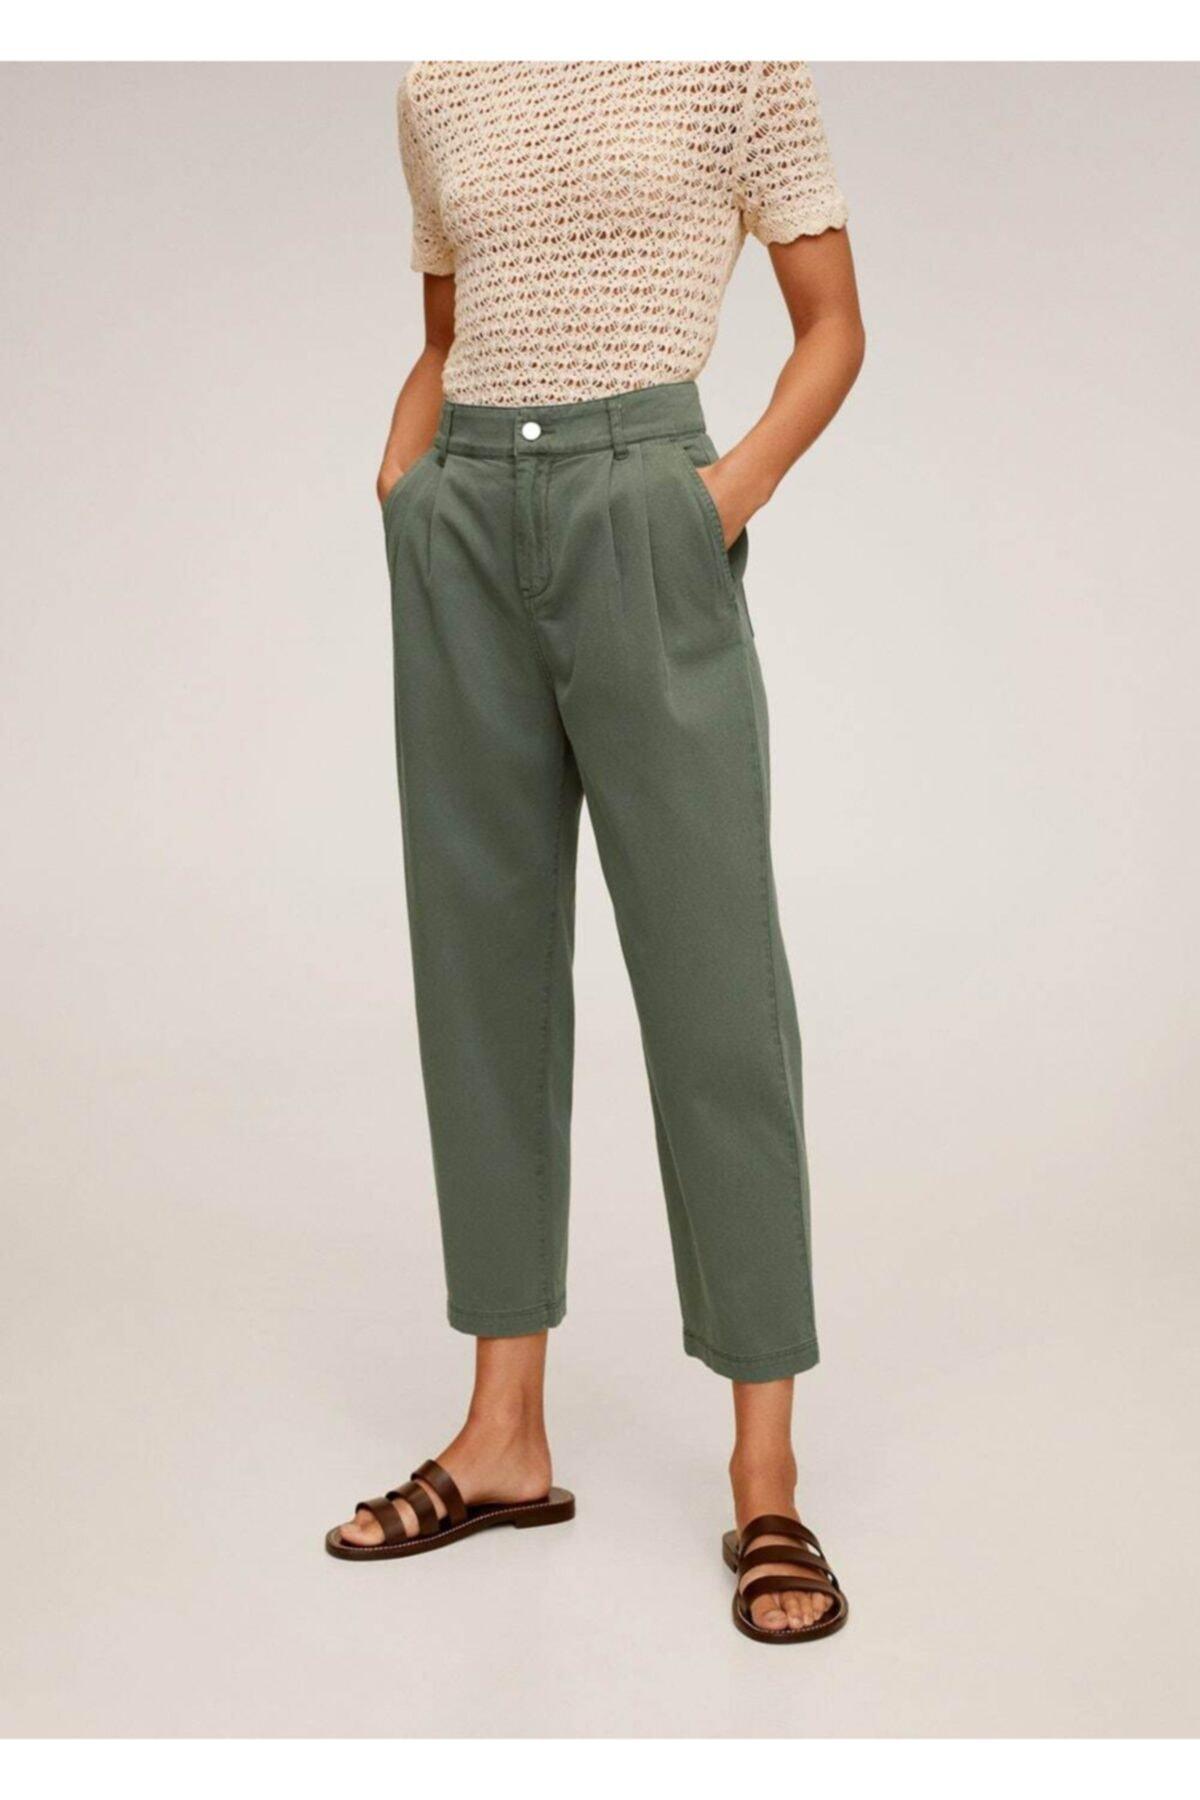 MANGO Woman Kadın Yeşil Rahat Koton Pantolon 67037664 2